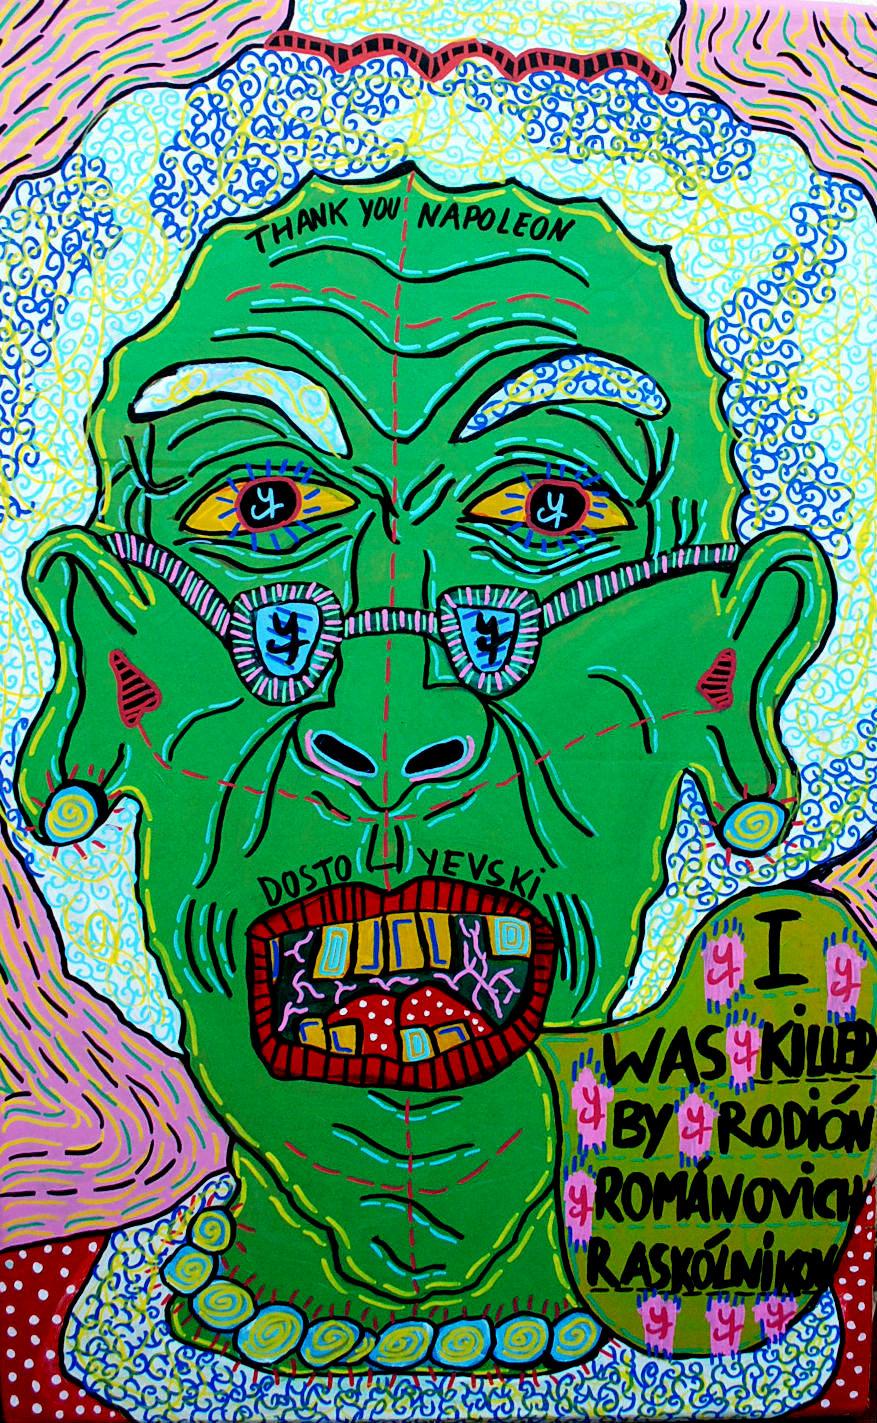 """I was killed by Rodión Románovich Raskólnikov"" , 2014   Acrylic paint and Posca marker on cardboard, 40 x 70 cm"